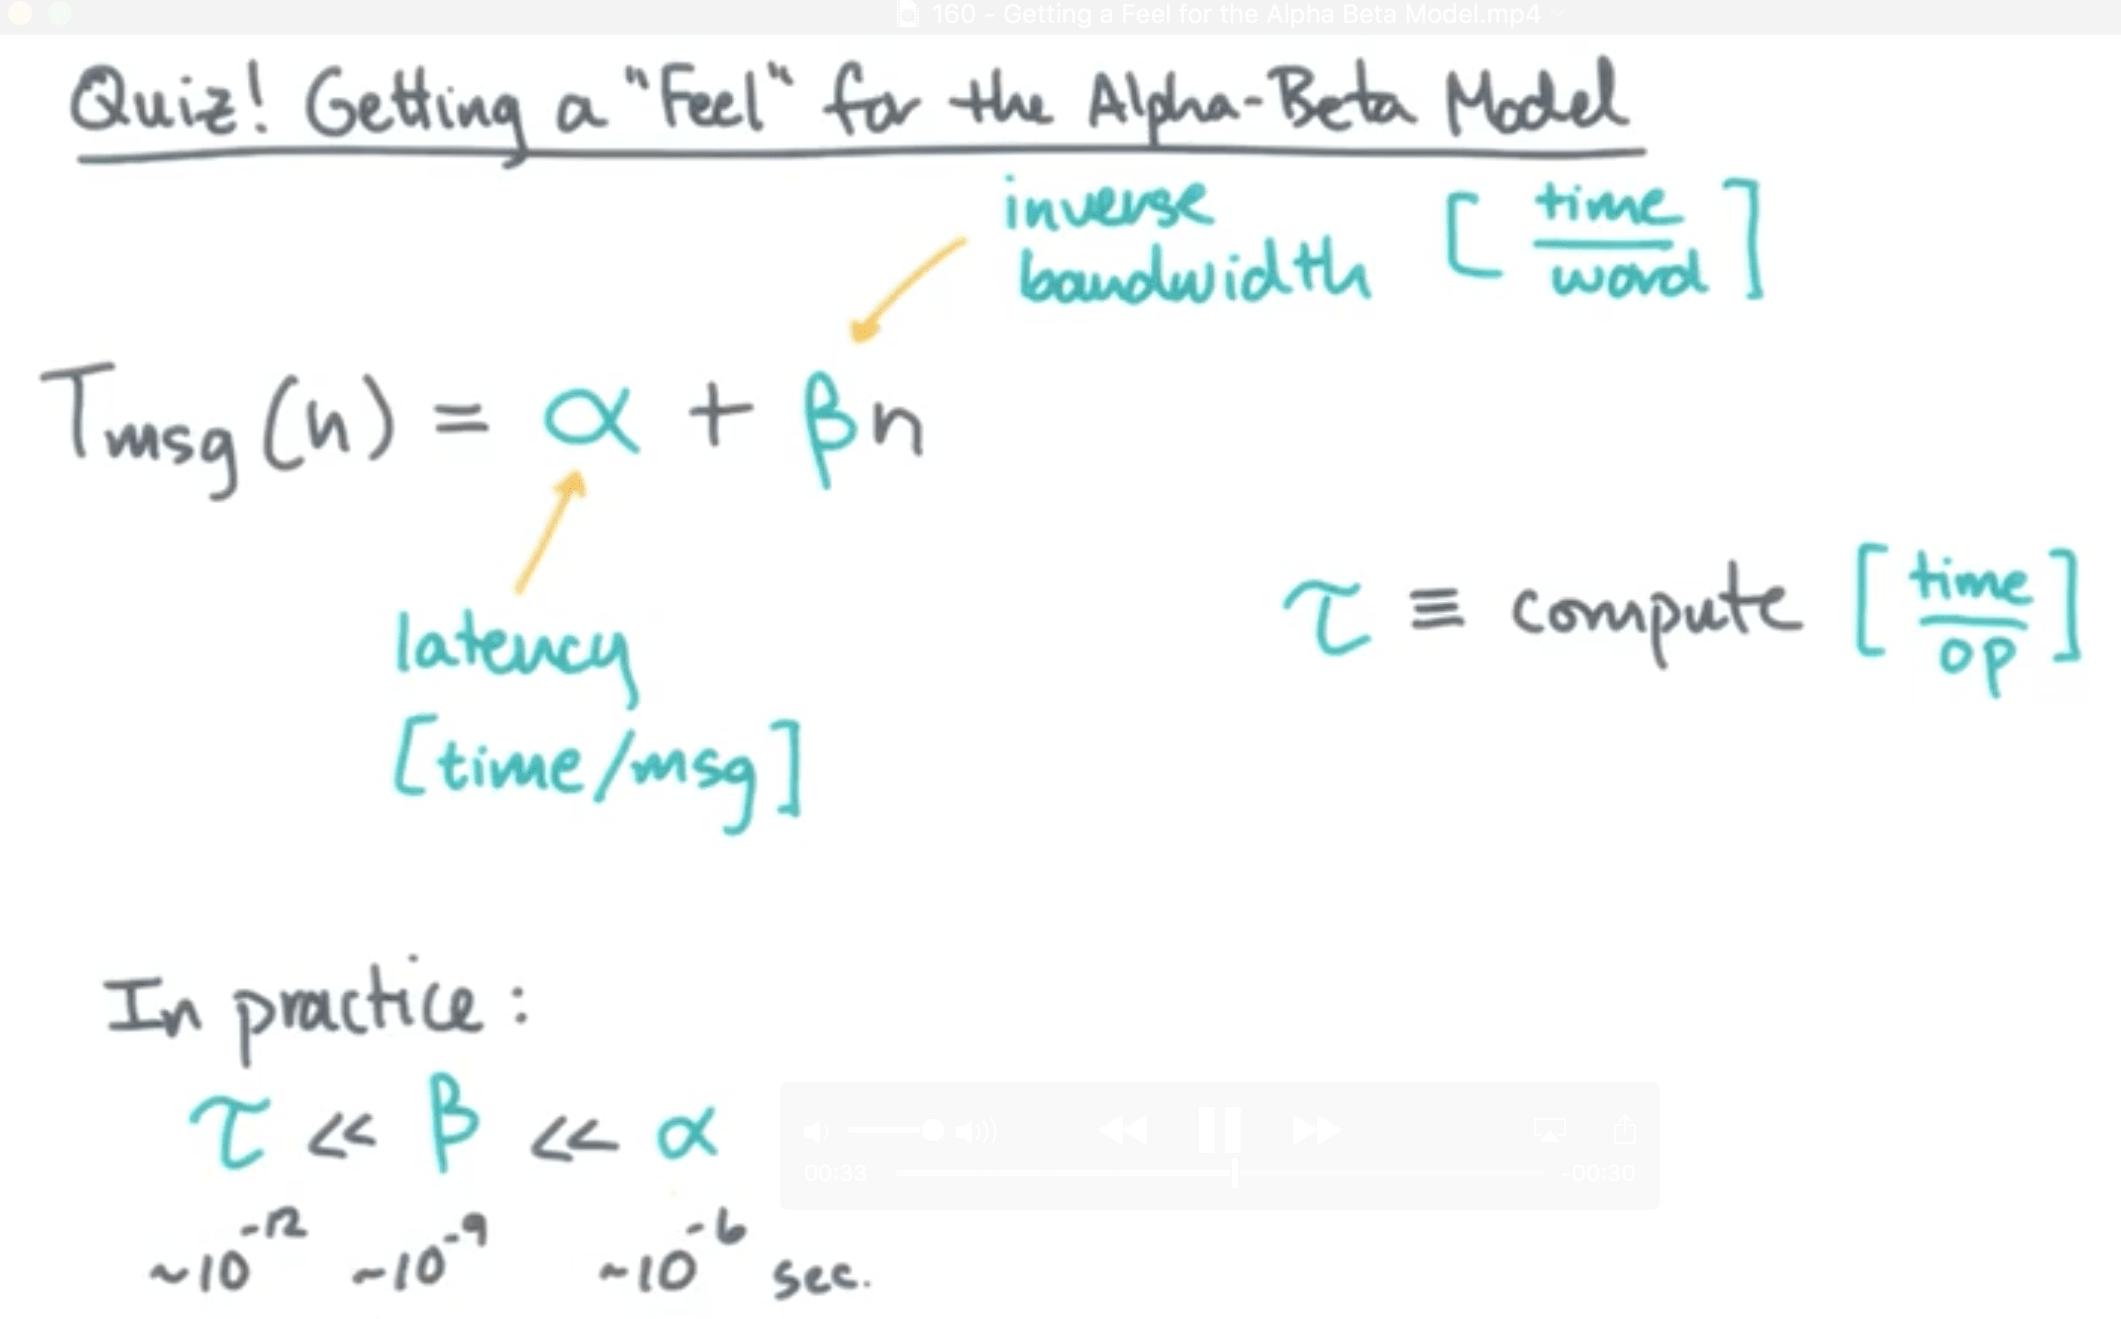 alpha_beta_model